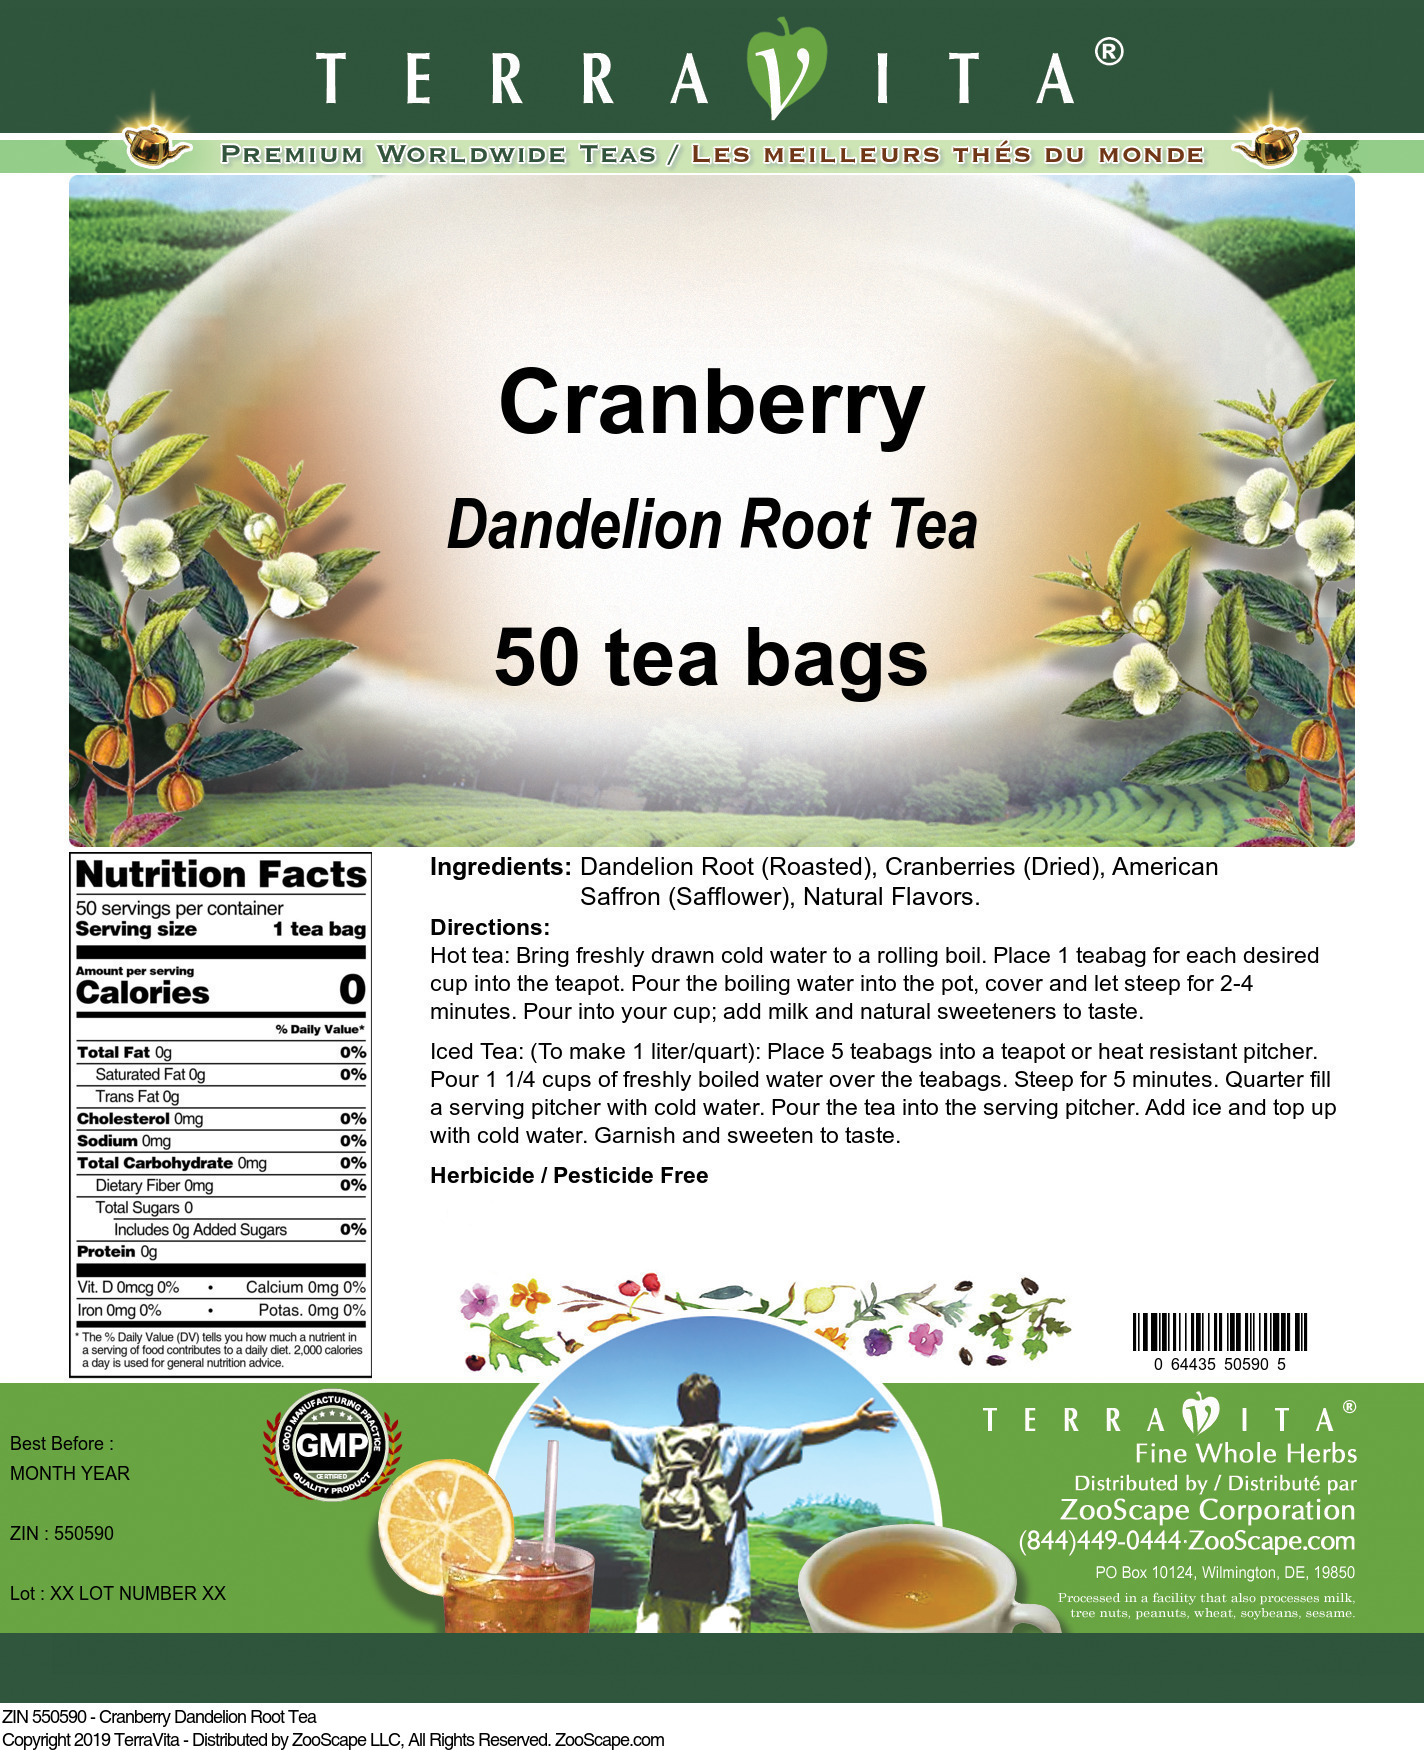 Cranberry Dandelion Root